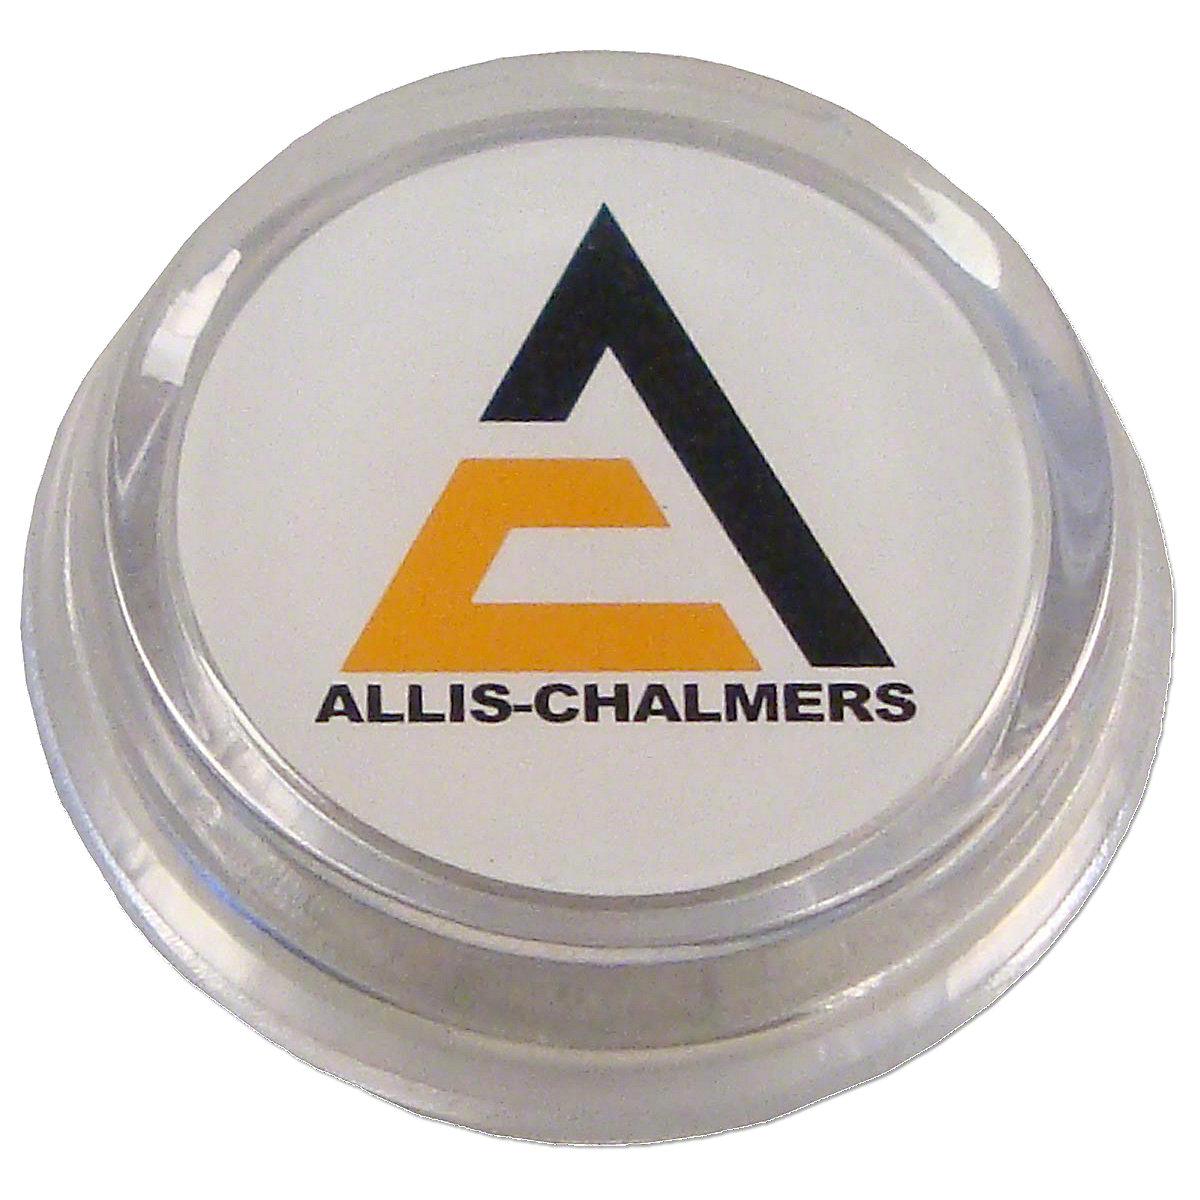 Steering Wheel Cap For Allis Chalmers: 190XT, 170, 175, 180, 185, 190, 200, 210, 220, 440, 545, 6060, 6070, 6080, 7000, 7010, 7020, 7030, 7045, 7060, 7080, 7580.